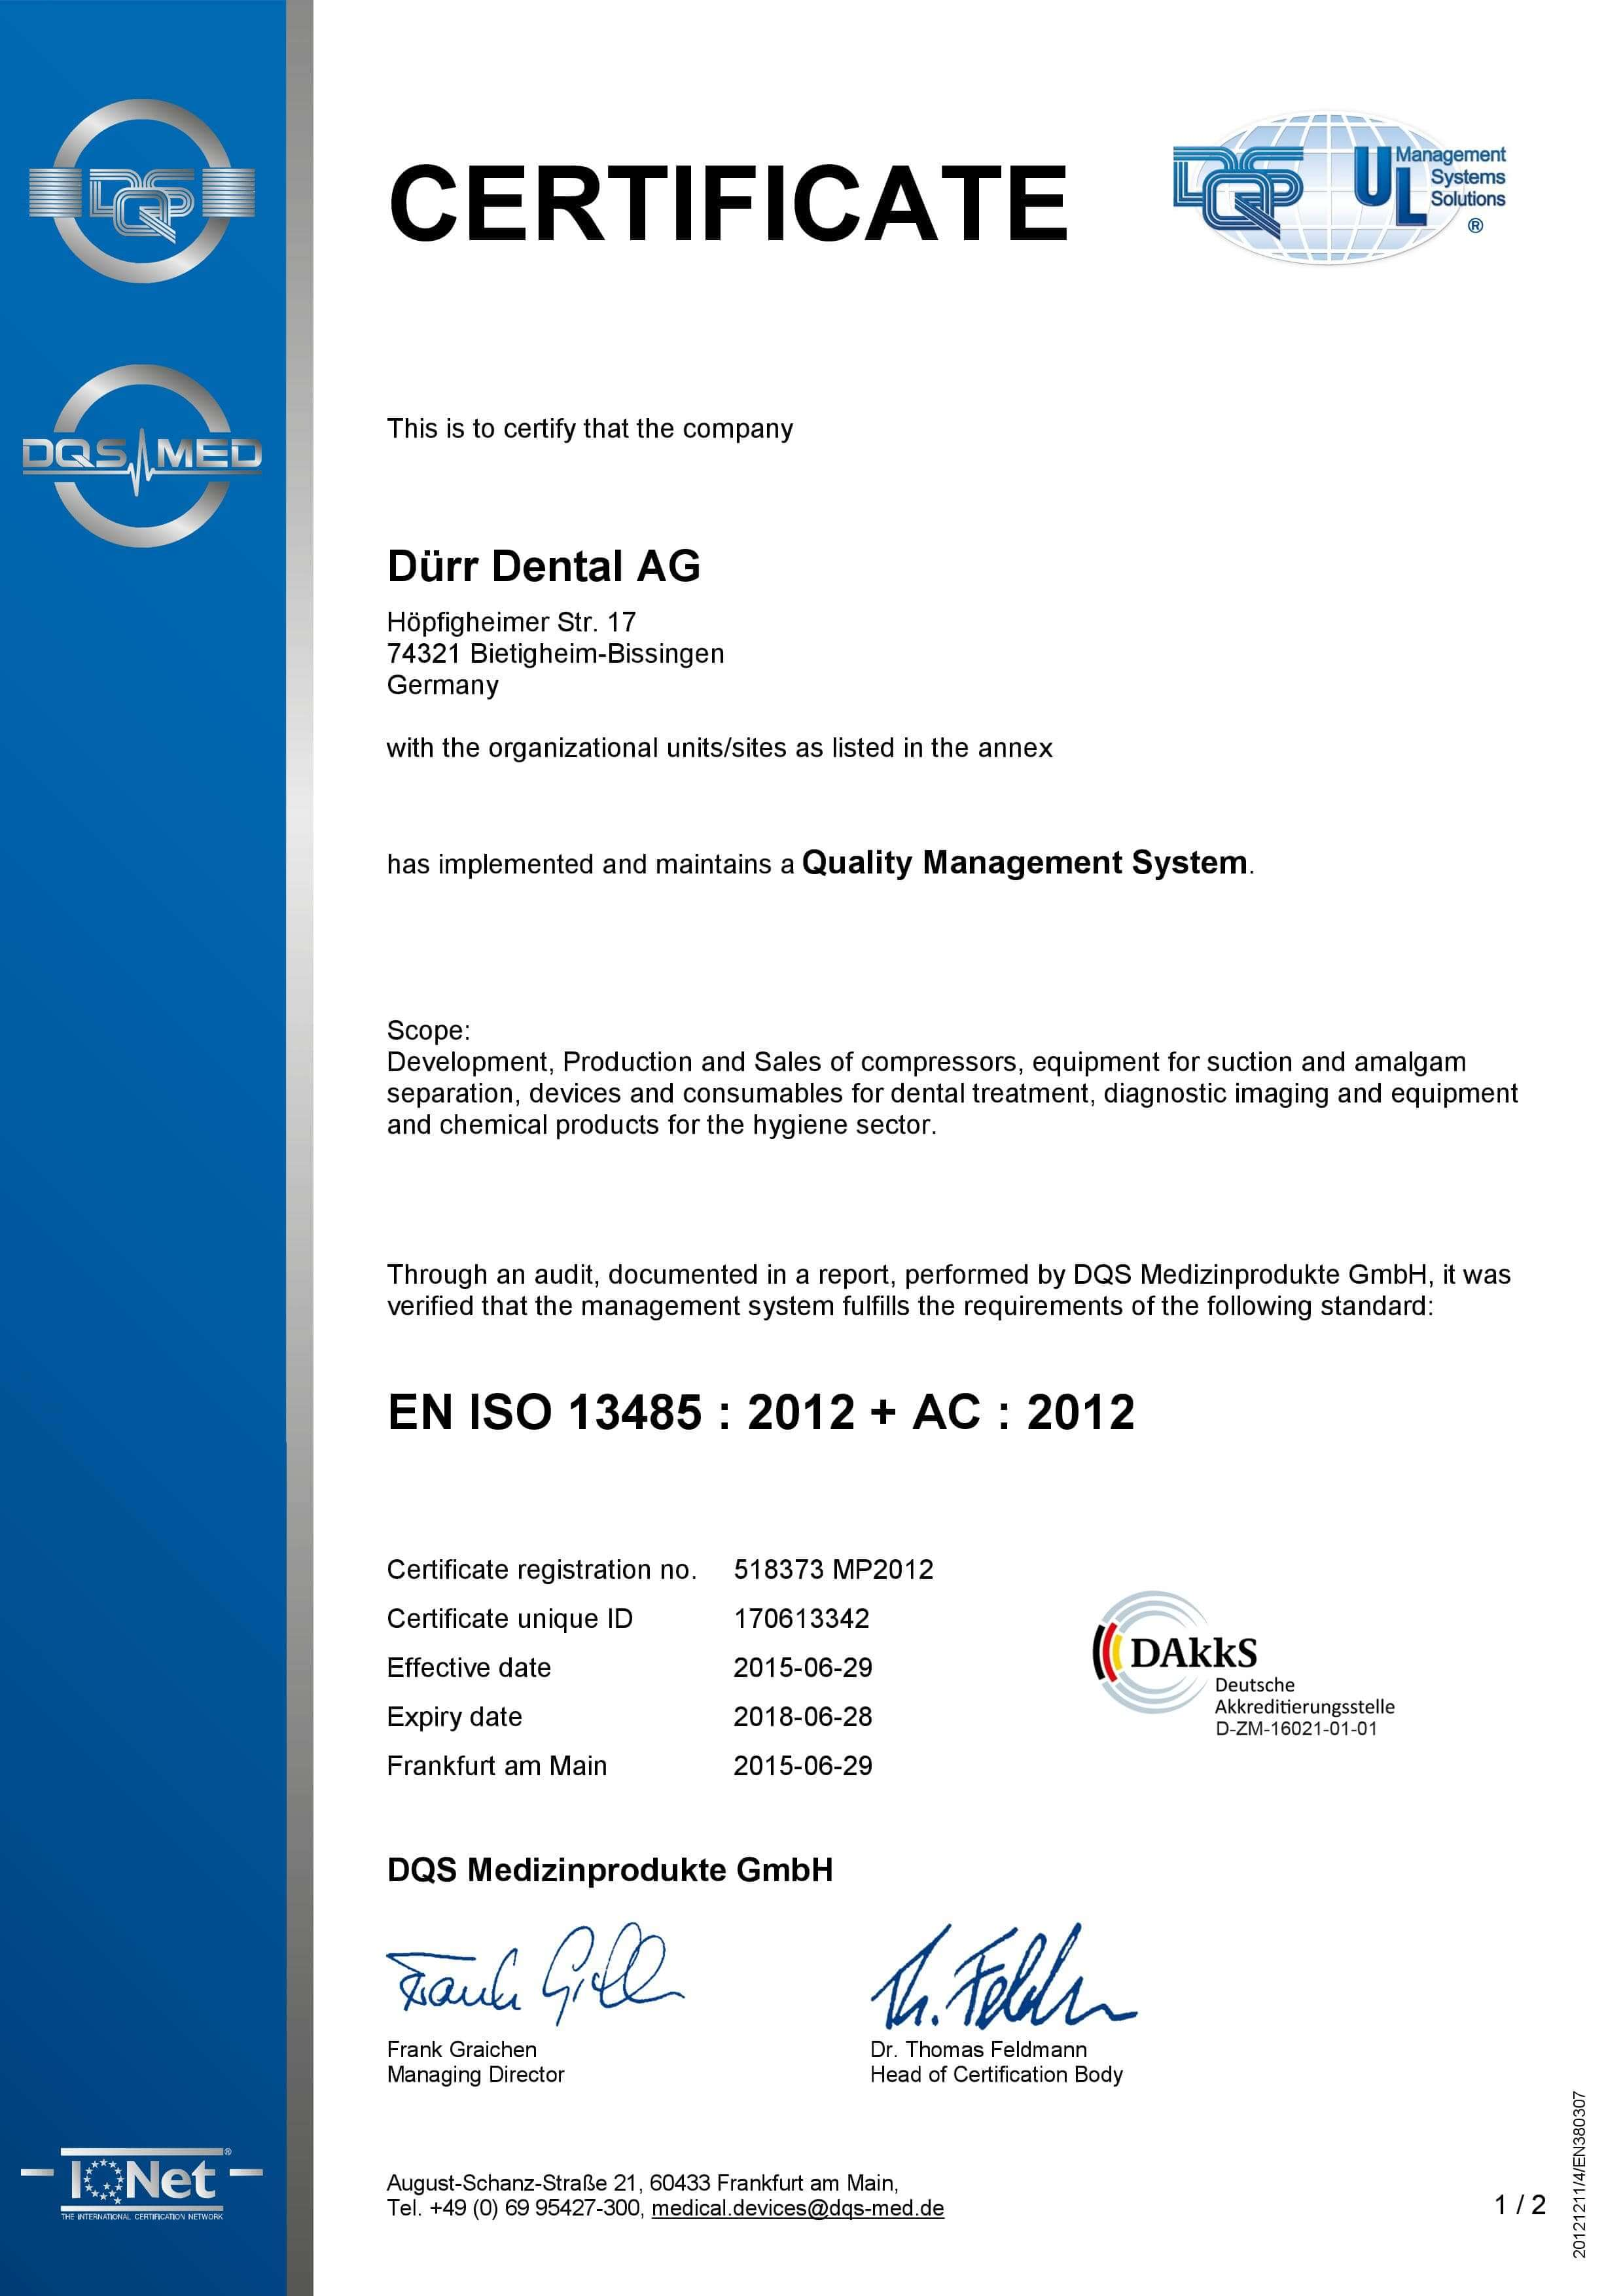 Certyfikat ISO DURR DENTAL